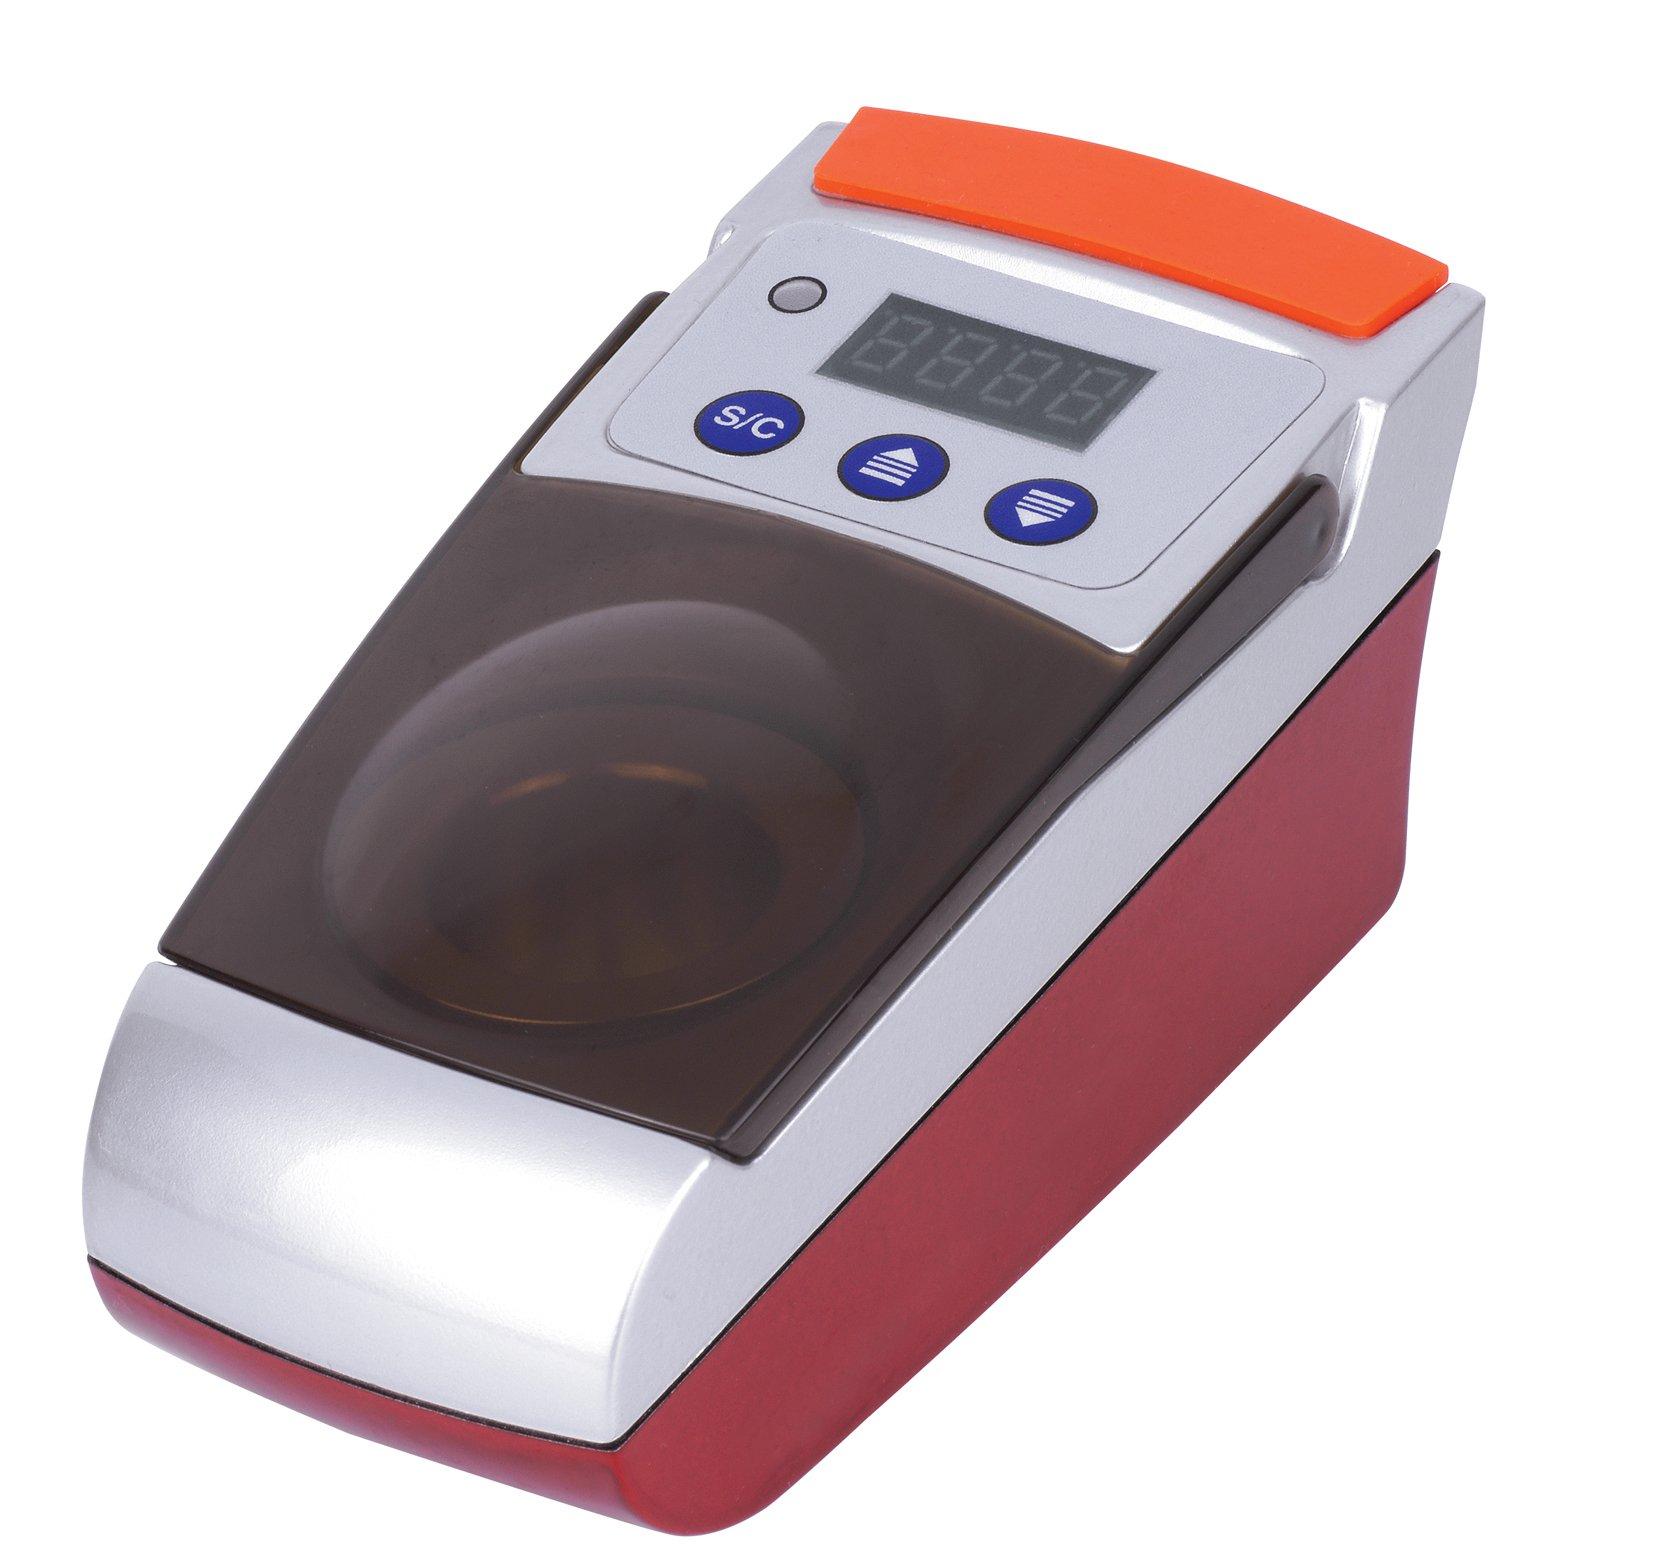 SDent® Portable Wax Heater Pot LED Display Wax Melting Dipping Pot Dental Lab FREE SHIPPING